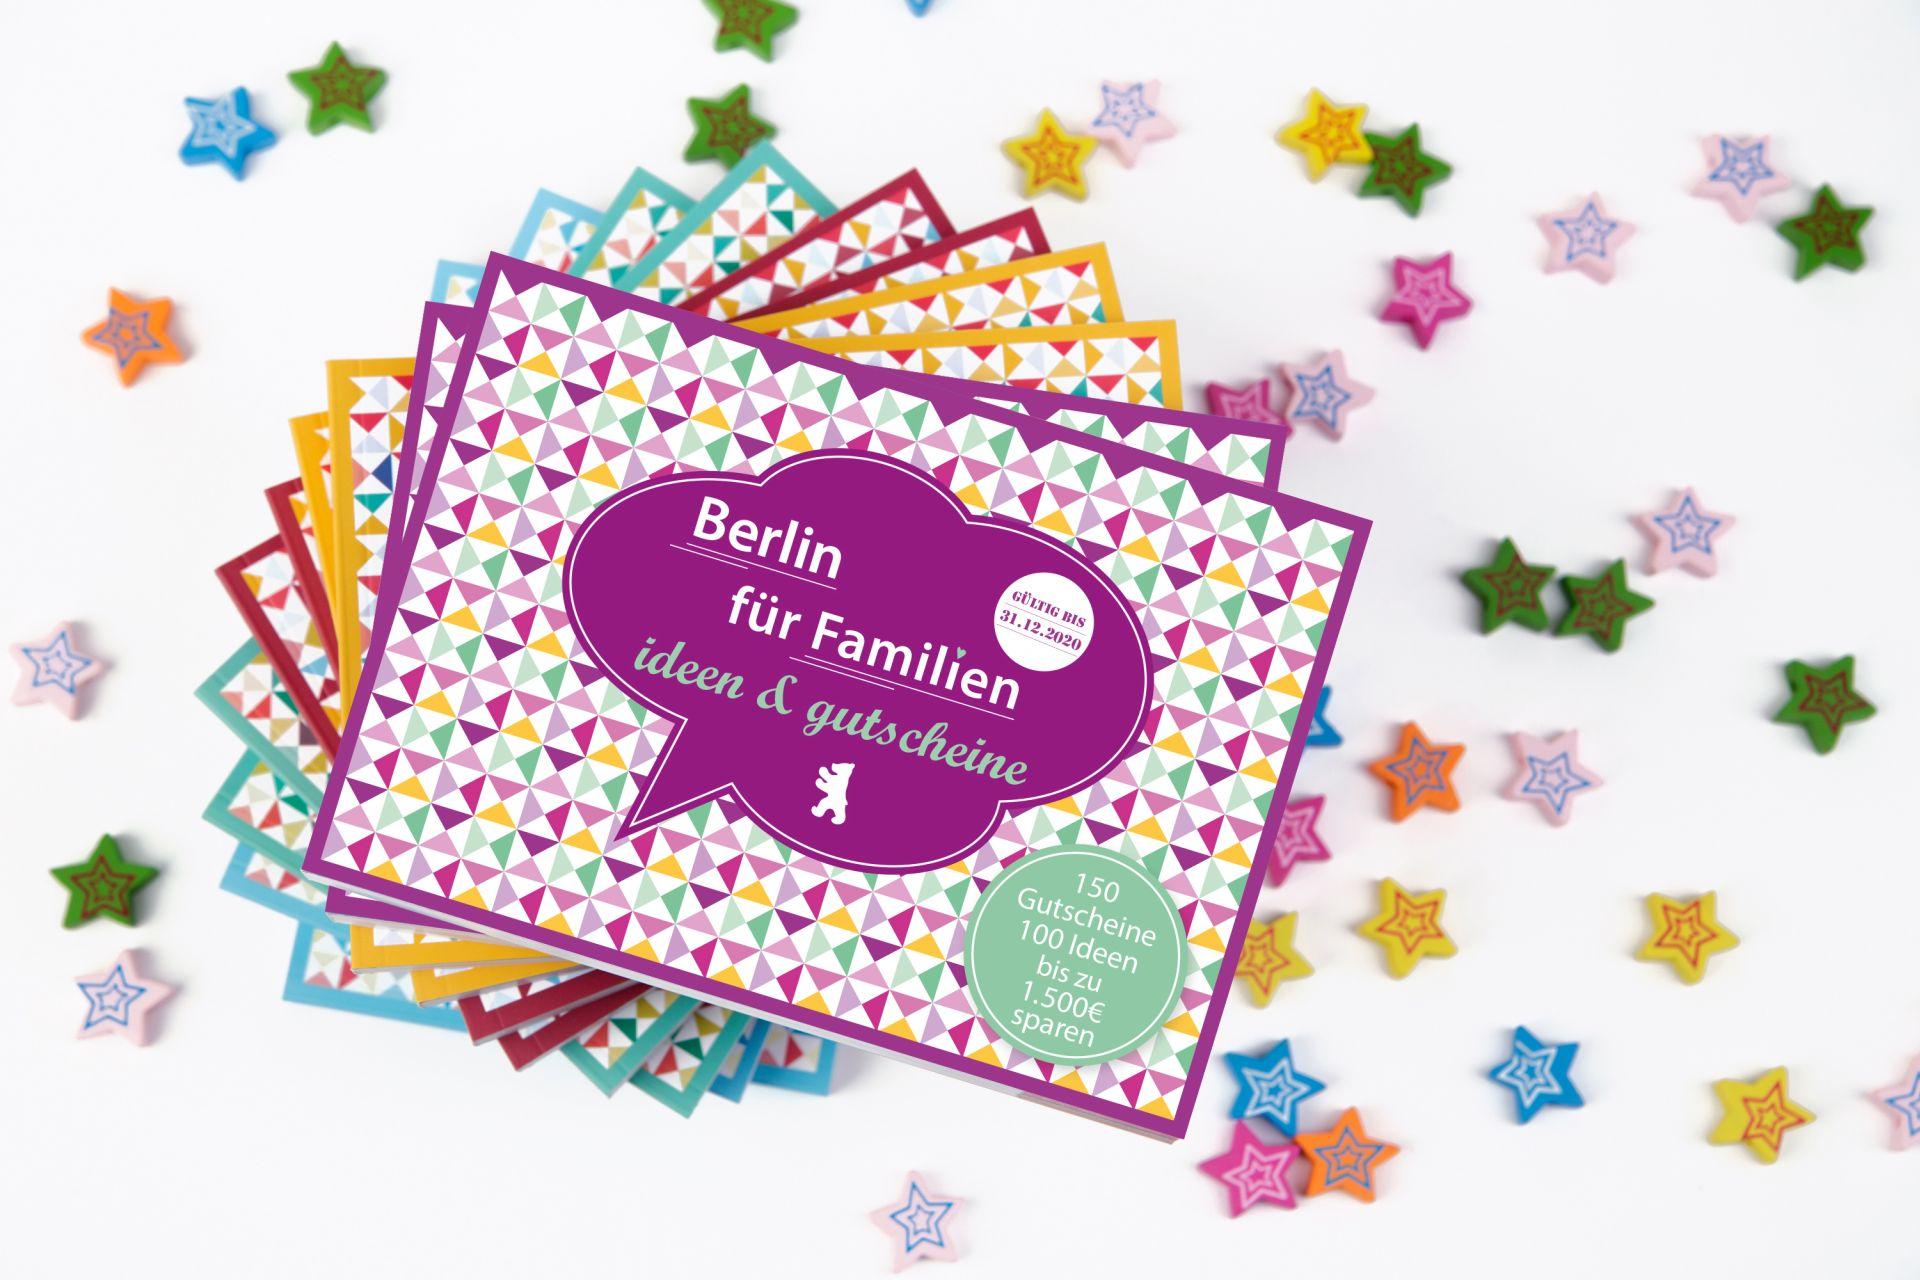 Gutscheinbuch Berlin - Gutscheinbuch: Berlin für Familien